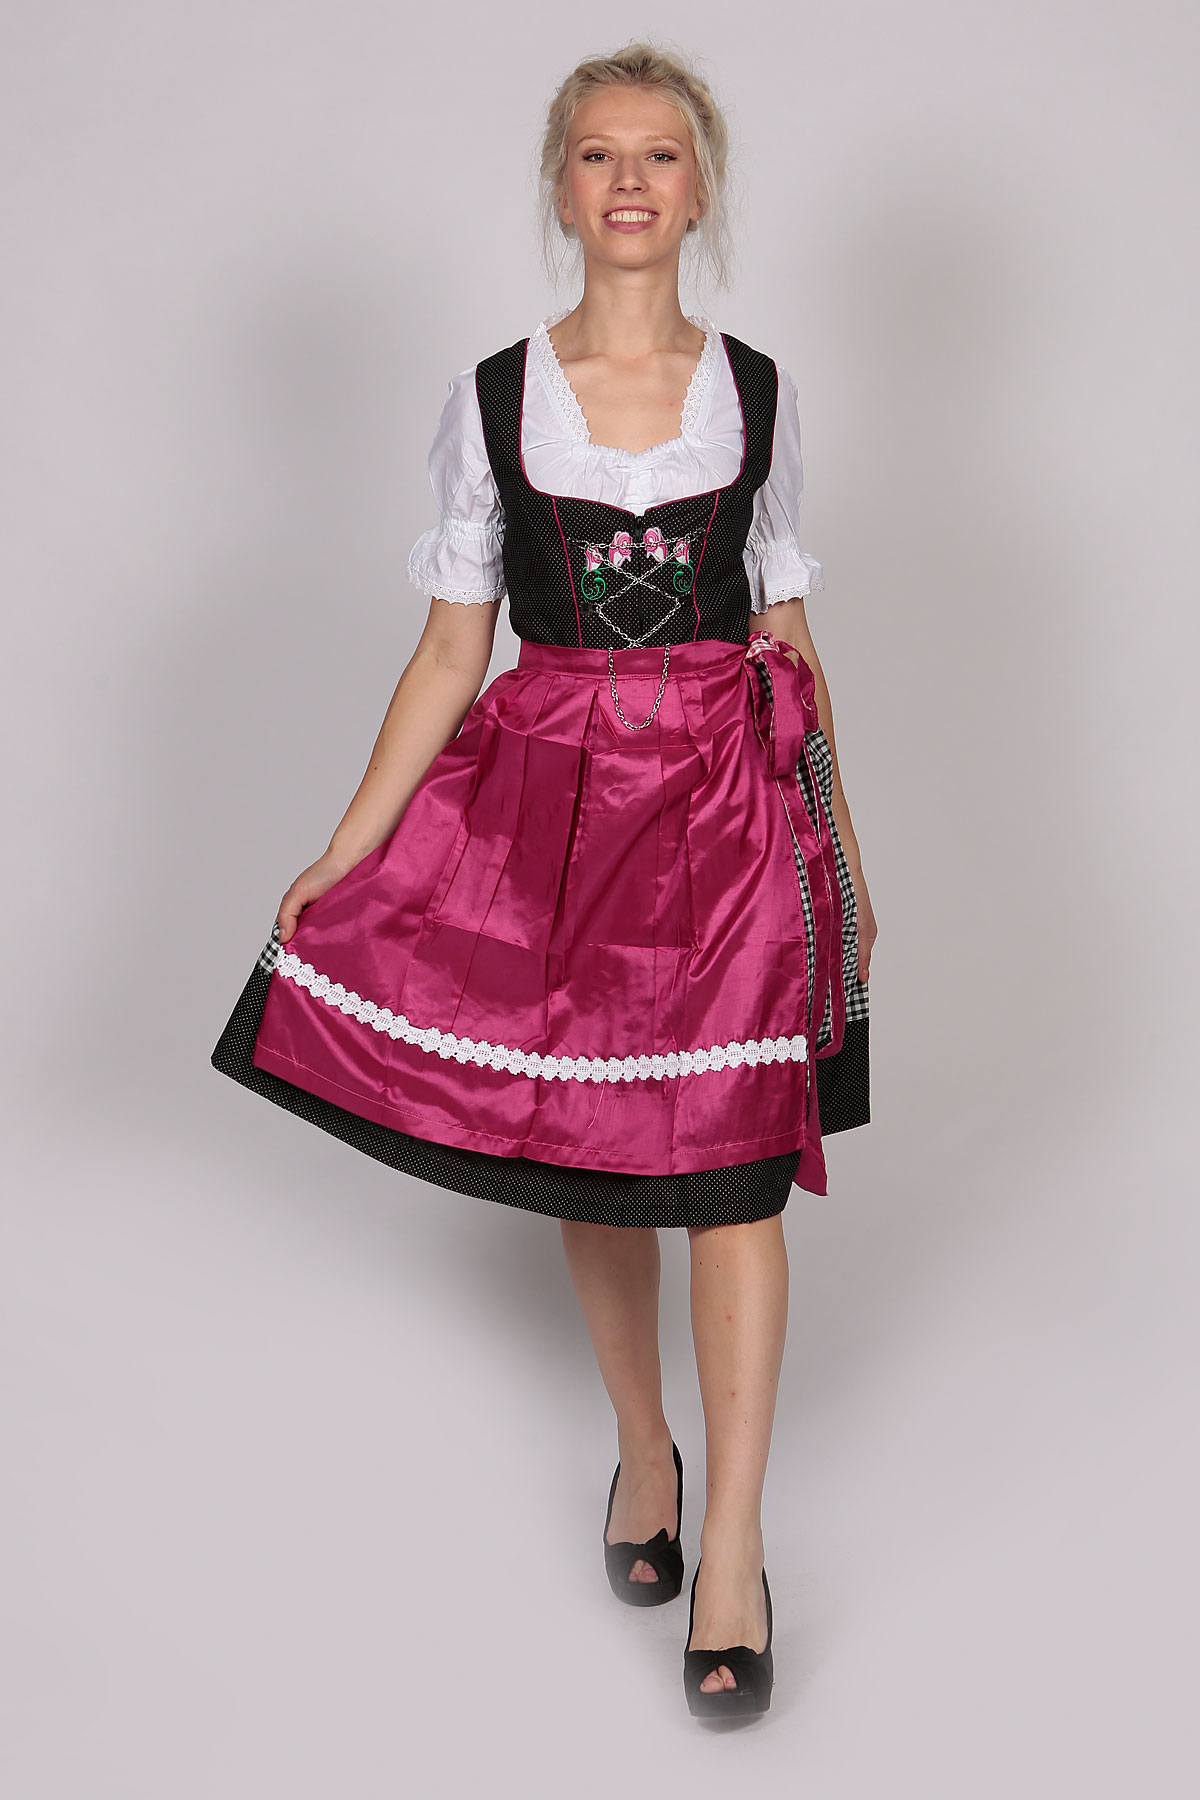 German Womens Dirndl Dress Bruna Wine - Lederhosen Store